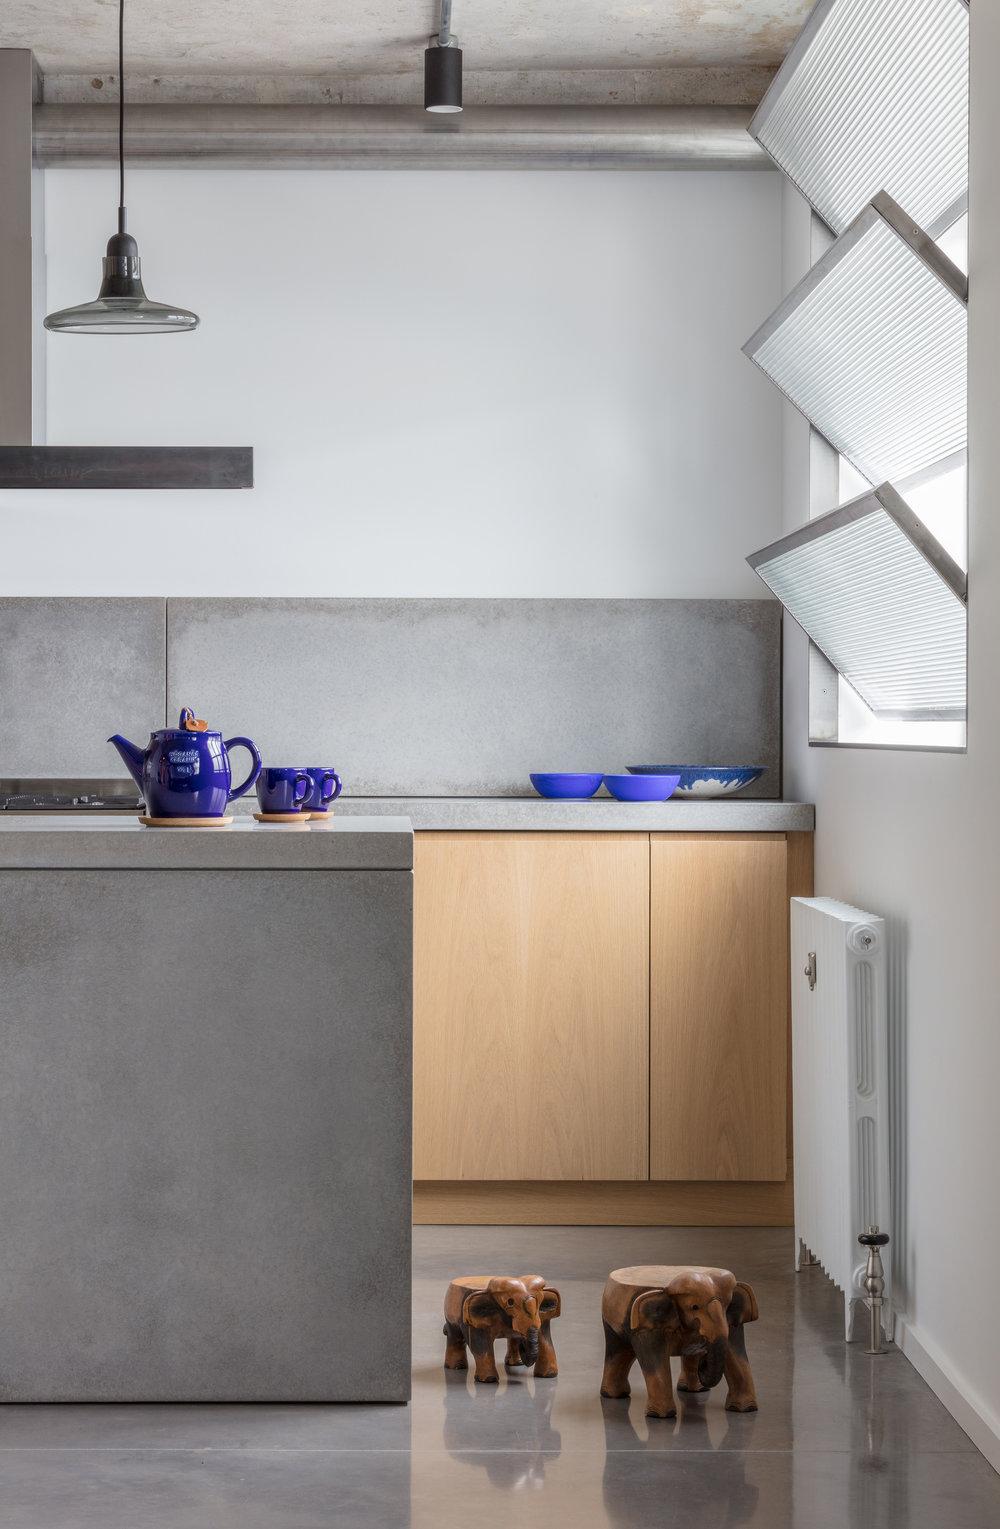 Union-Wharf-Islington-London-Concrete-Shutters-Kitchen-Island-Interior-Residential-Architect.jpg